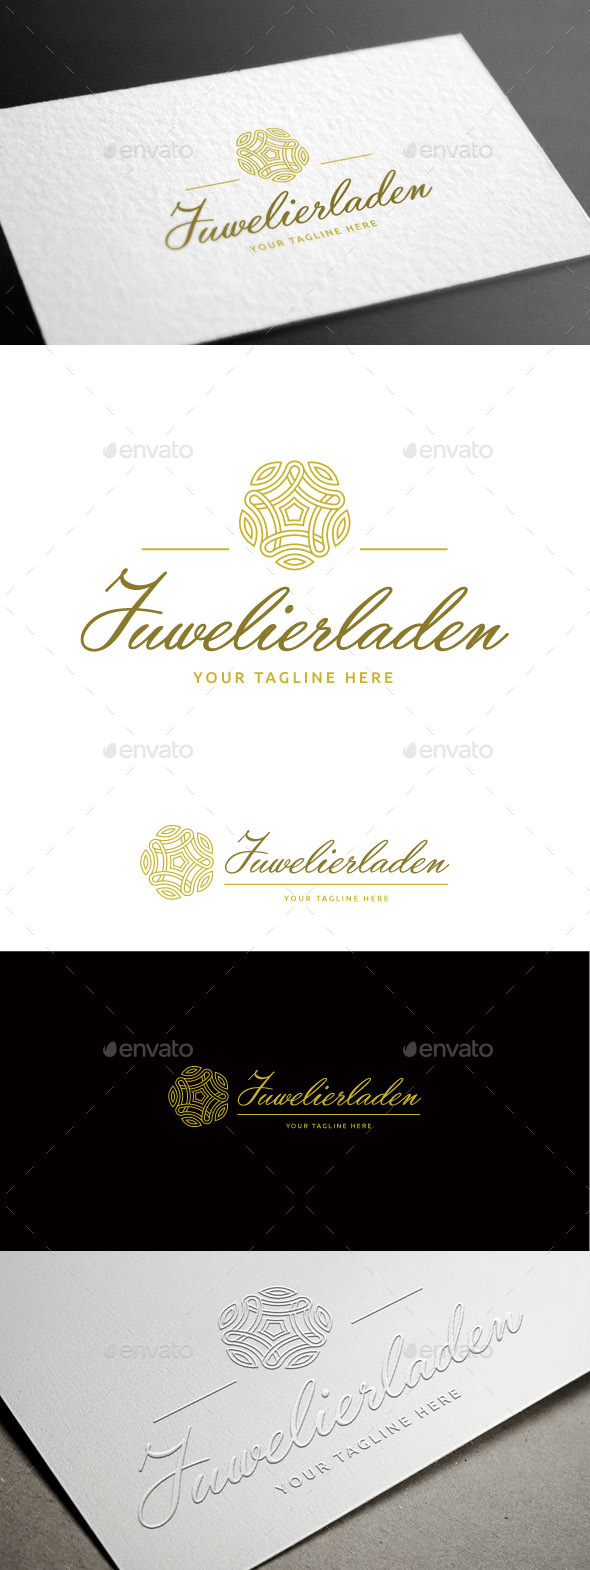 GraphicRiver Juwelierladen Logo Template 9147270